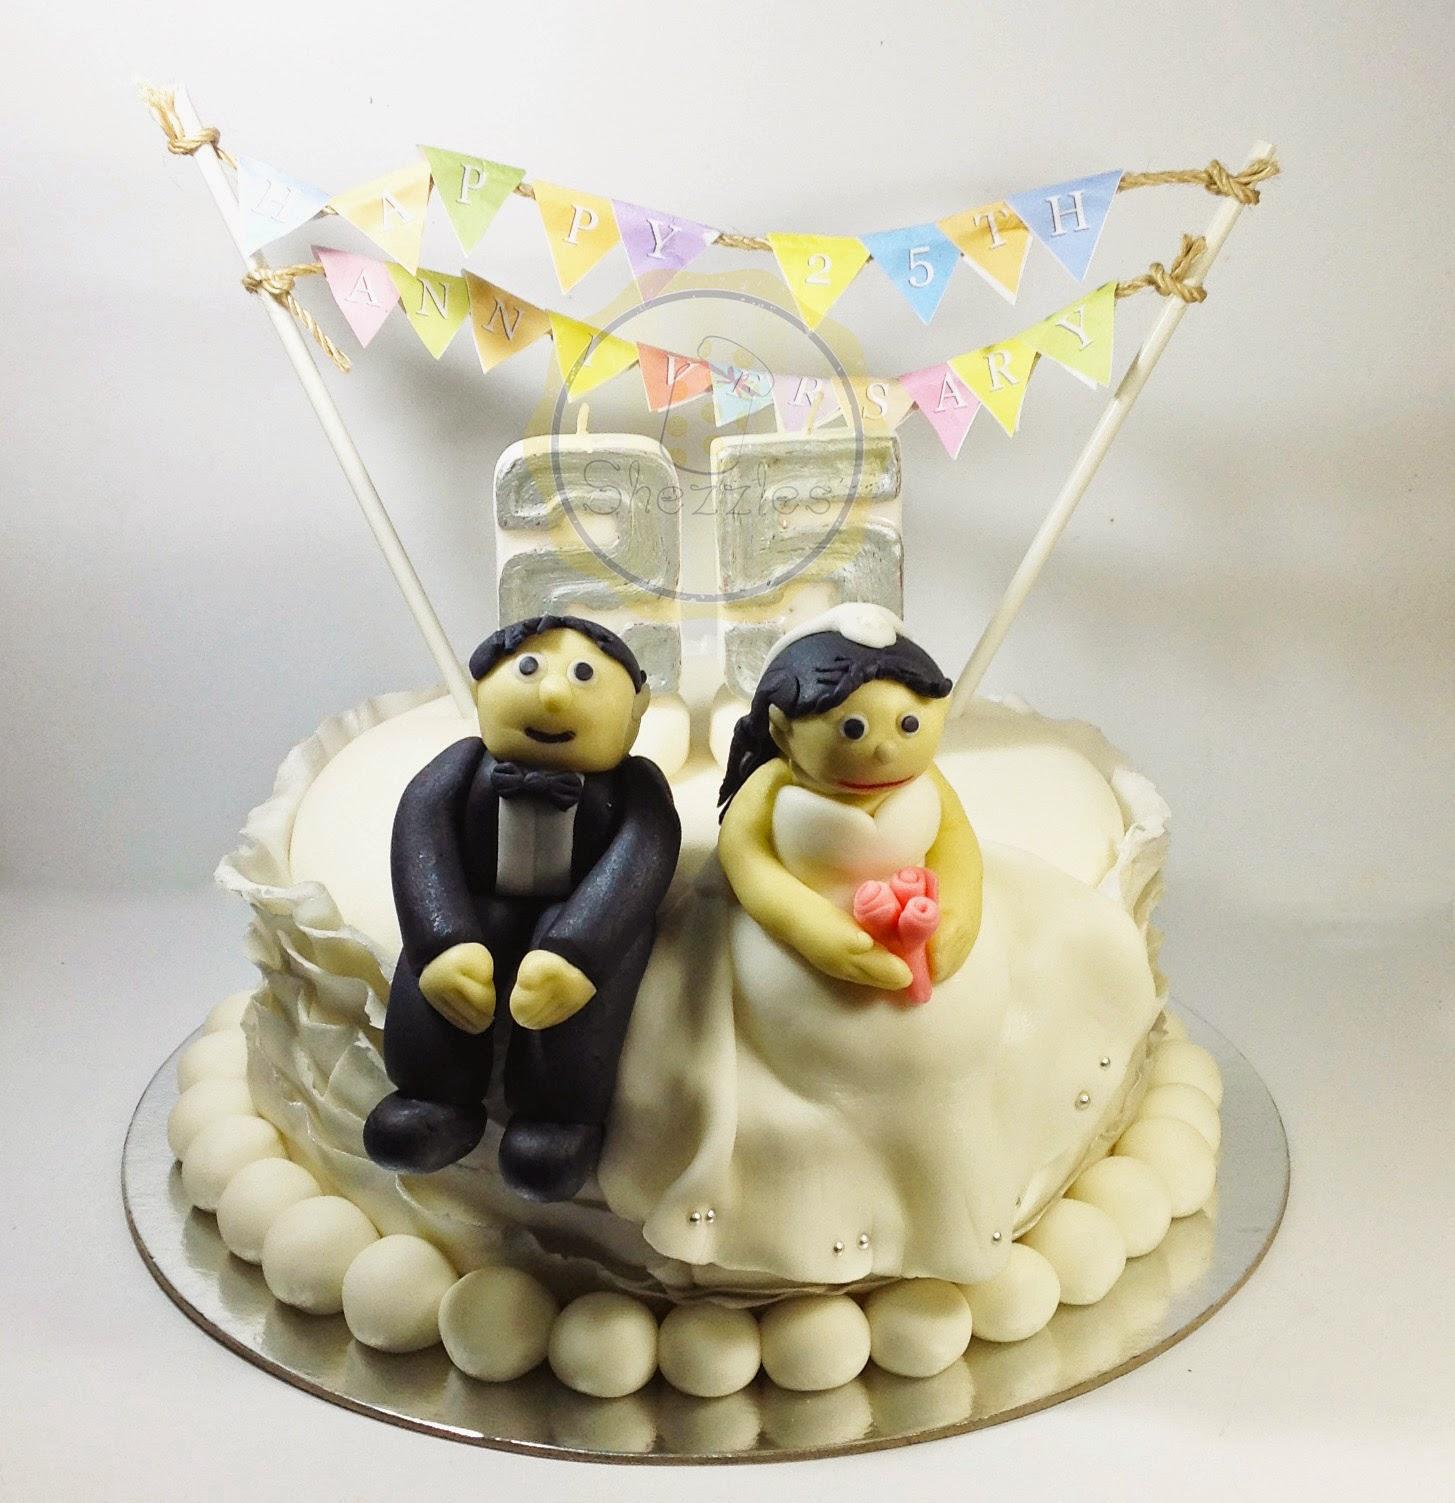 Shezzles Dessert in a jar: Silver Wedding Anniversary Cake